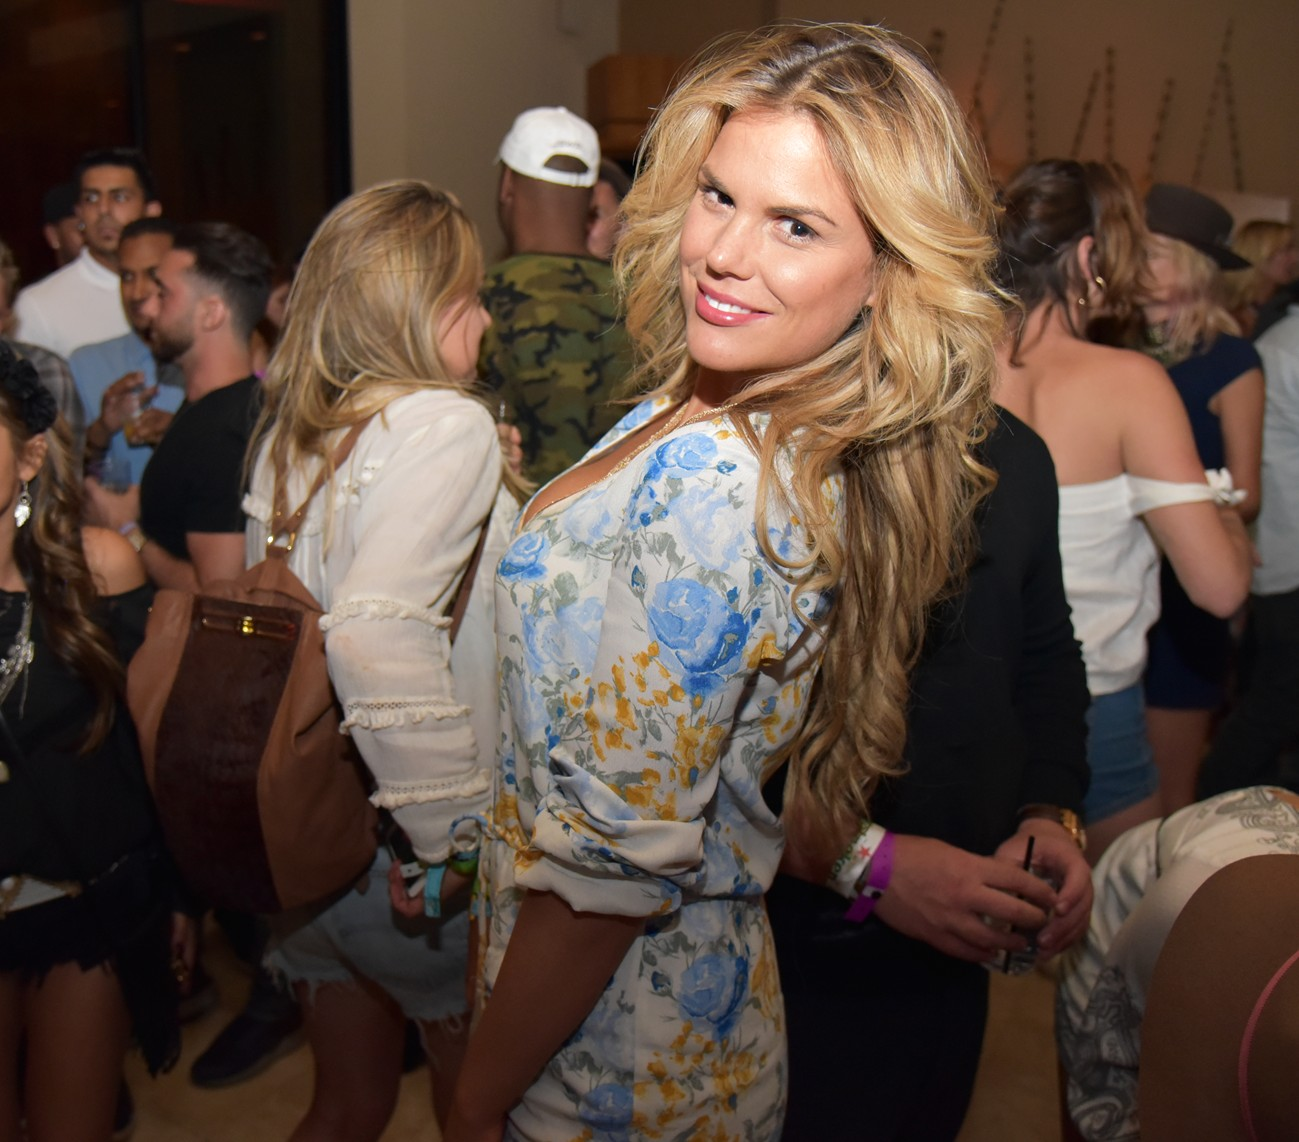 Bob Zangrillo party, Coachella, Rosalind Lipsett